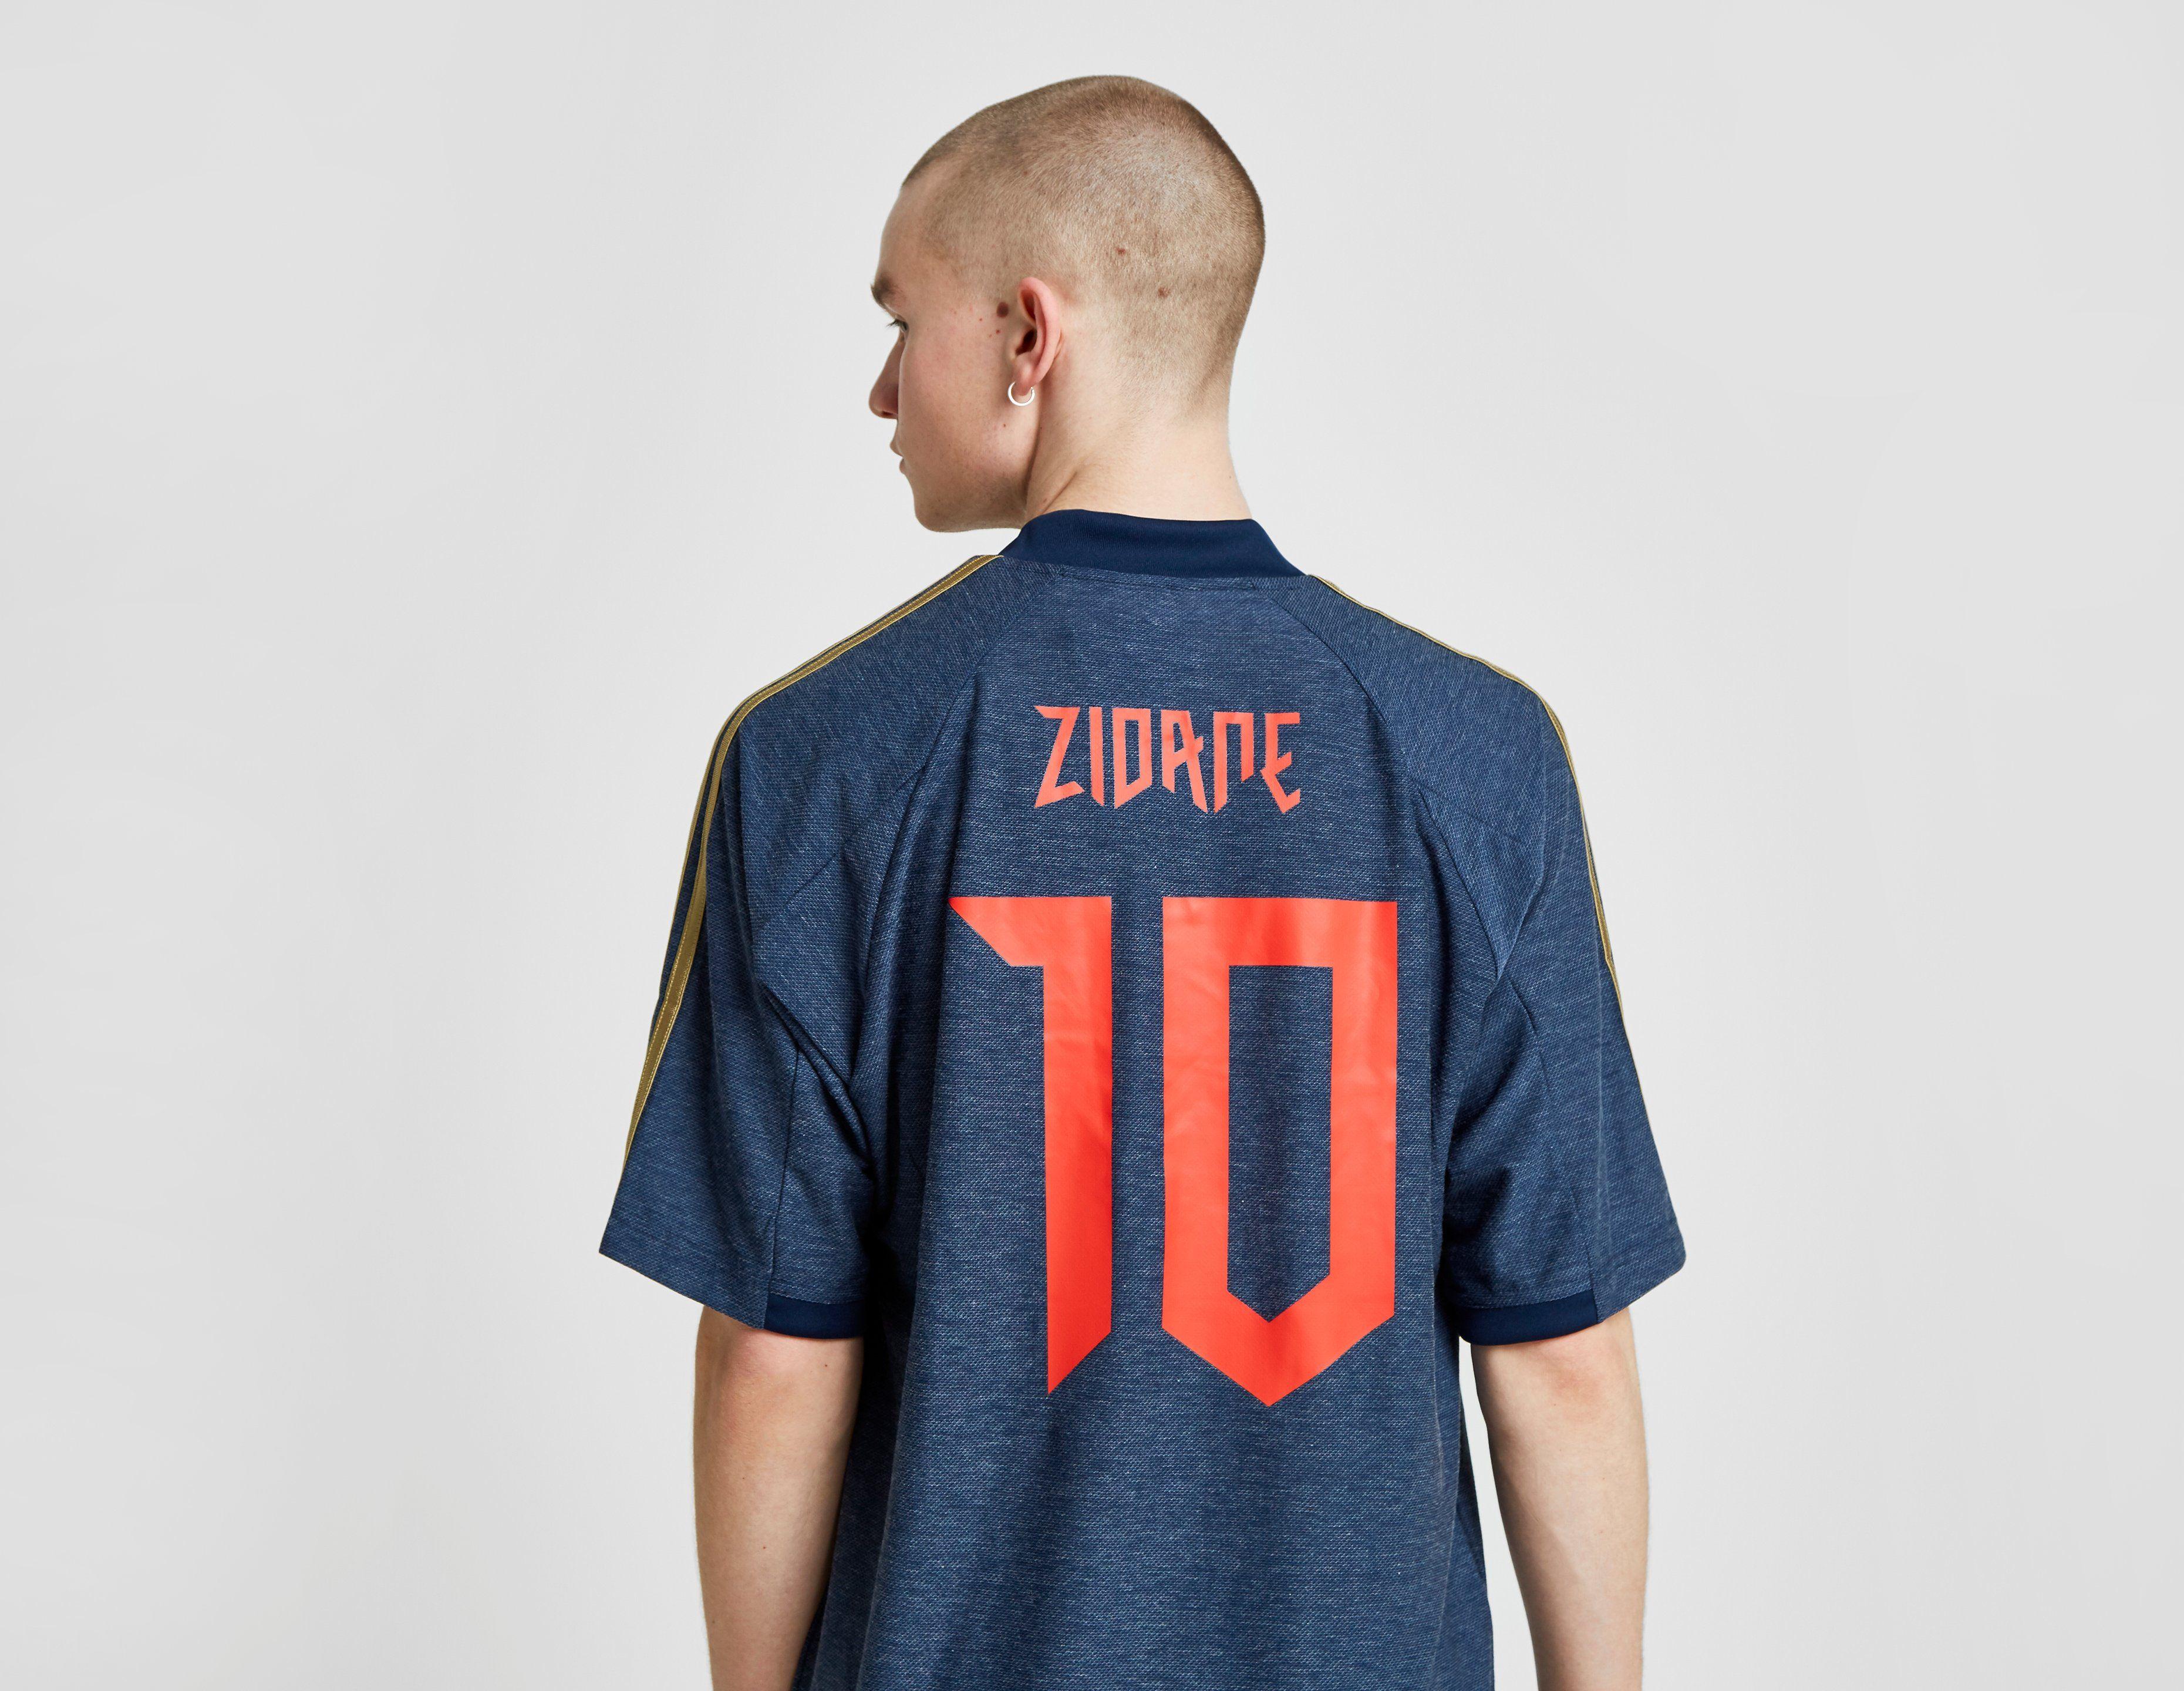 adidas Consortium Predator Zidane Jersey